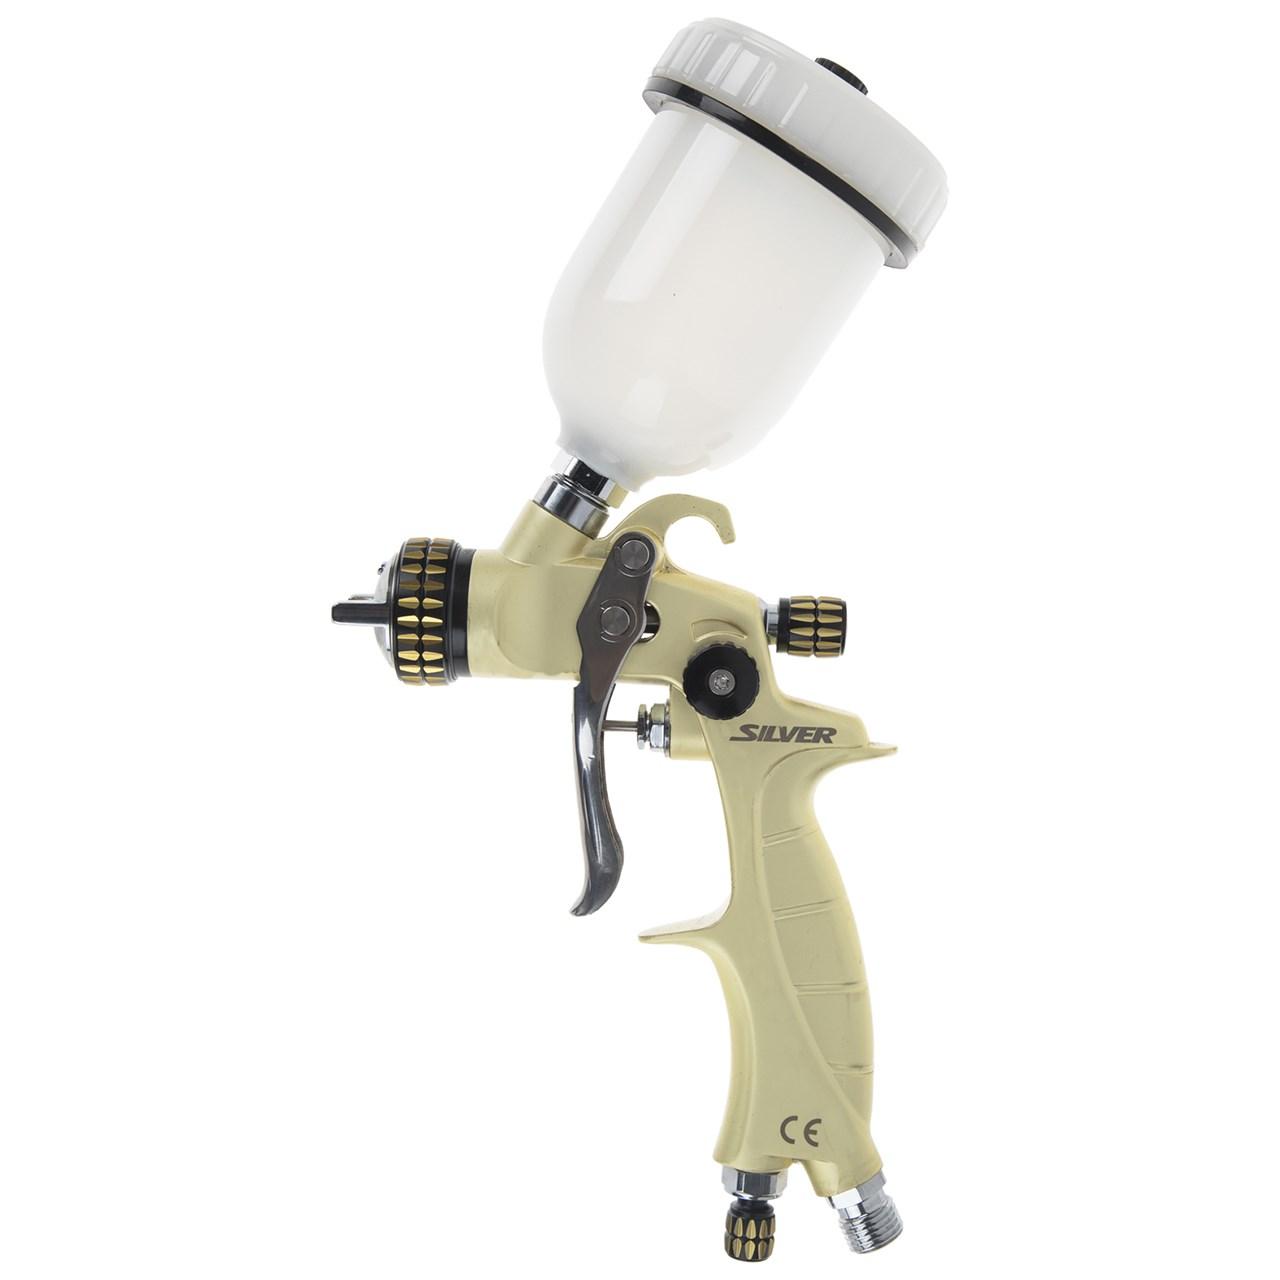 پیستوله بادی سیلور مدل GTAPA002